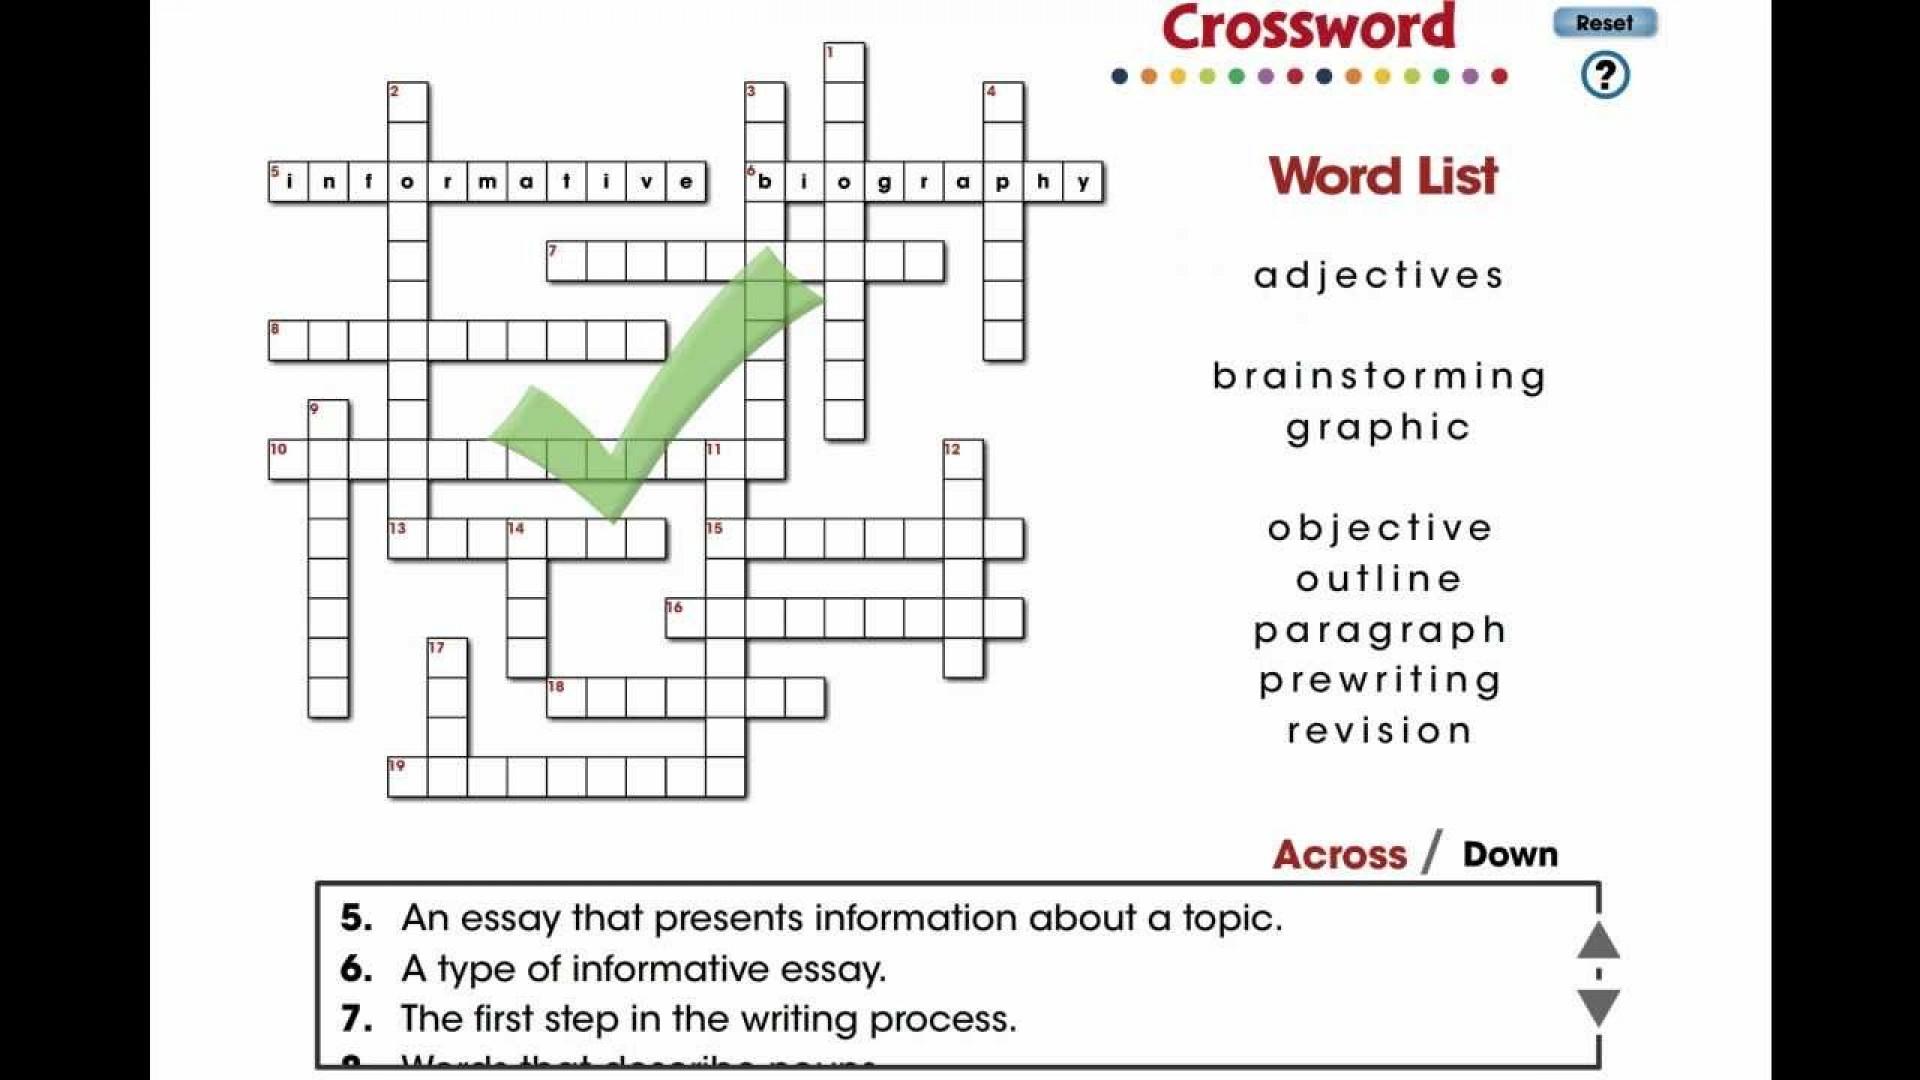 001 Maxresdefault Essay Crossword Fascinating Byline Clue Short Puzzle Persuasive 1920